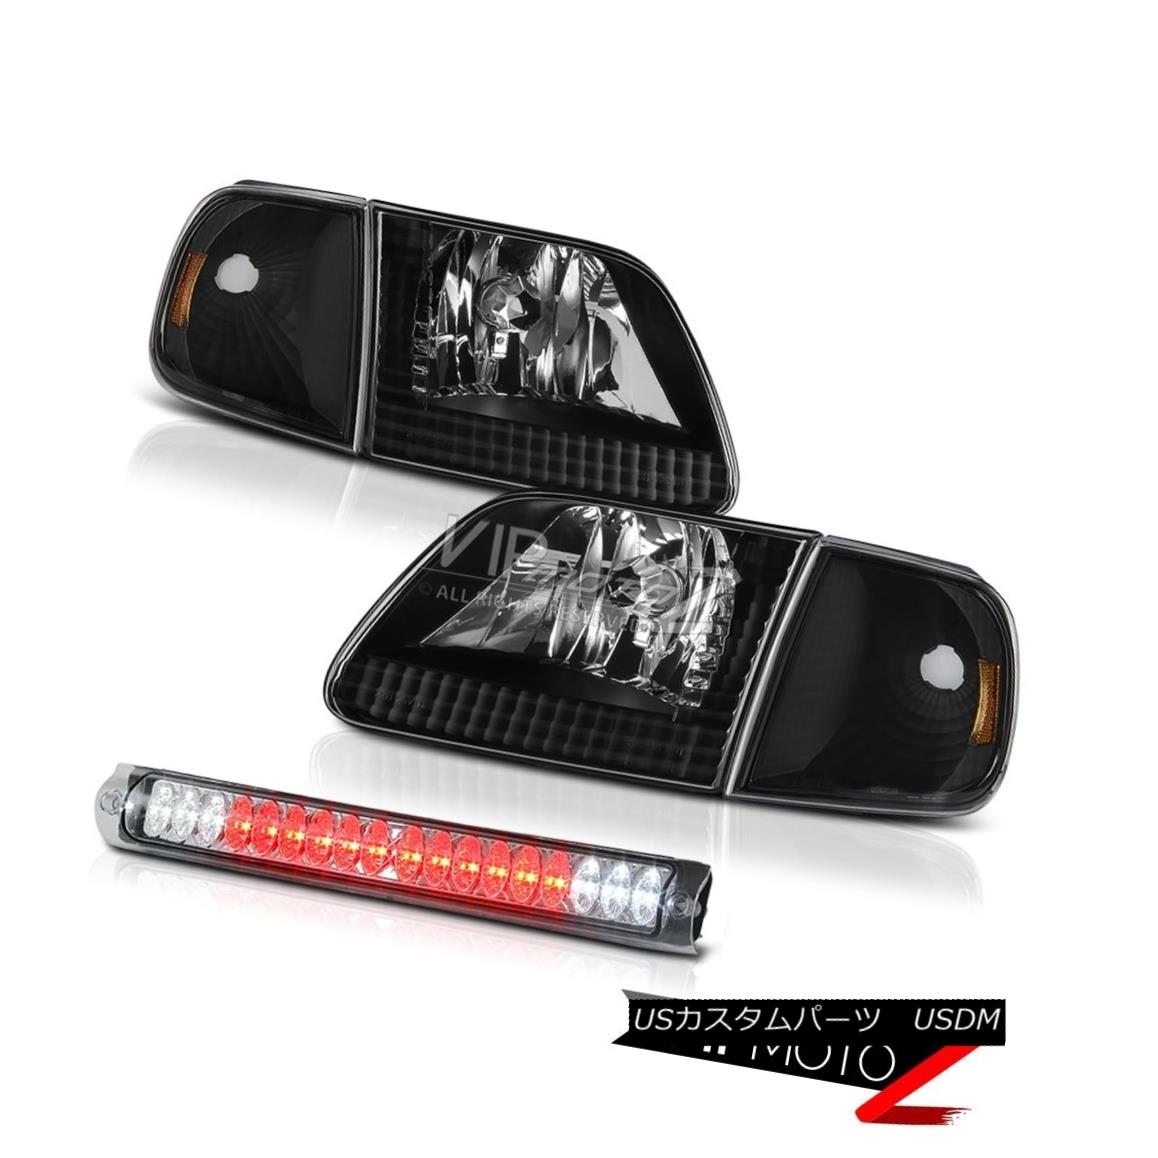 Roof Stop Matte 1997-2003 Black ヘッドライト Flareside Flareside XL Clear F150 LED F150 Ford Ford Signal Headlamp ブラックヘッドランプマットシグナルルーフストップLEDクリア1997-2003 XL